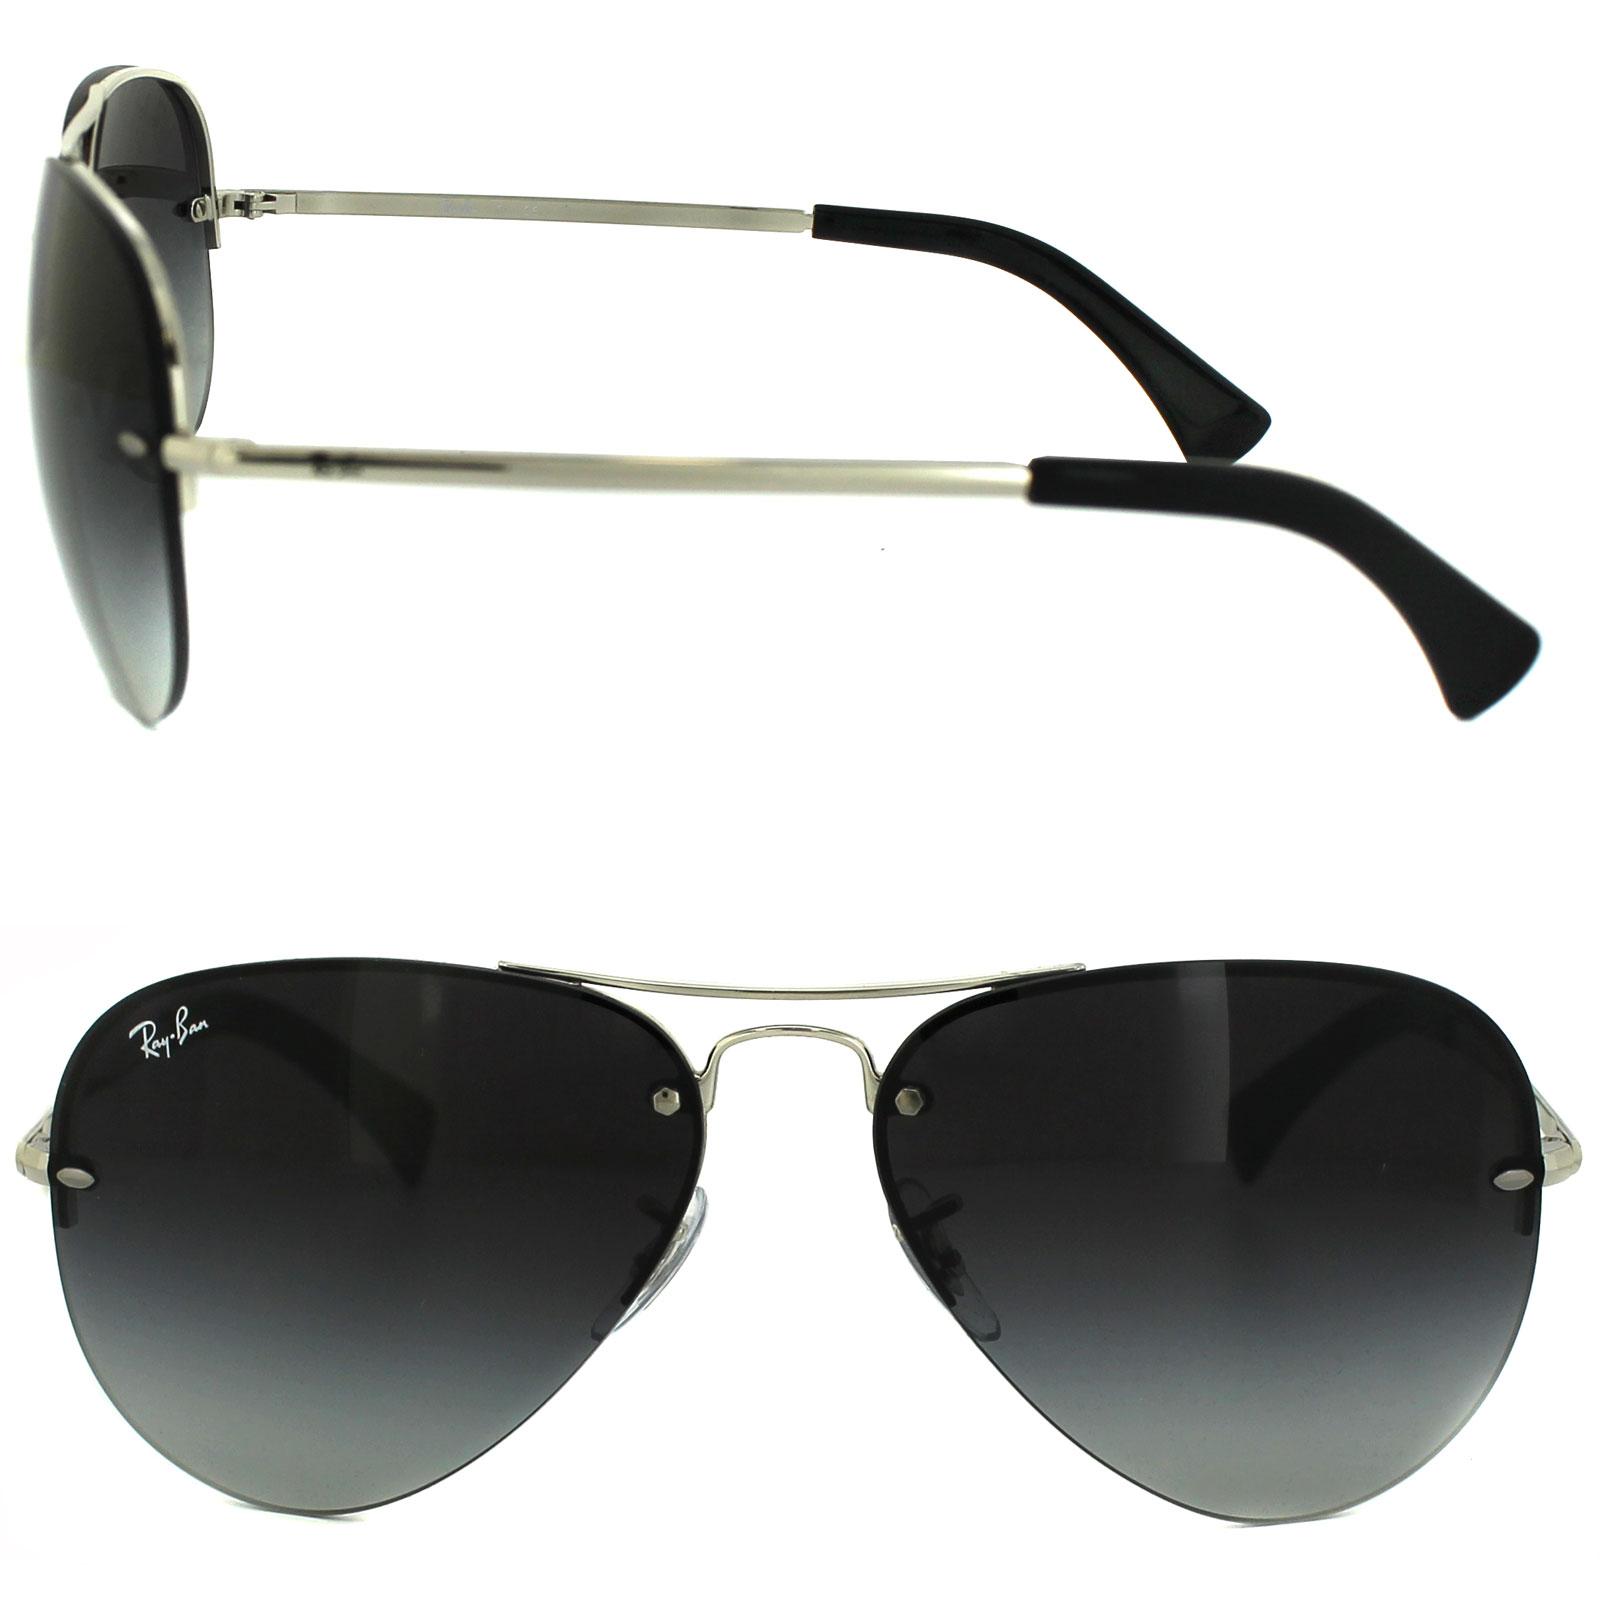 Cheap Ray Ban 3449 Sunglasses Discounted Sunglasses